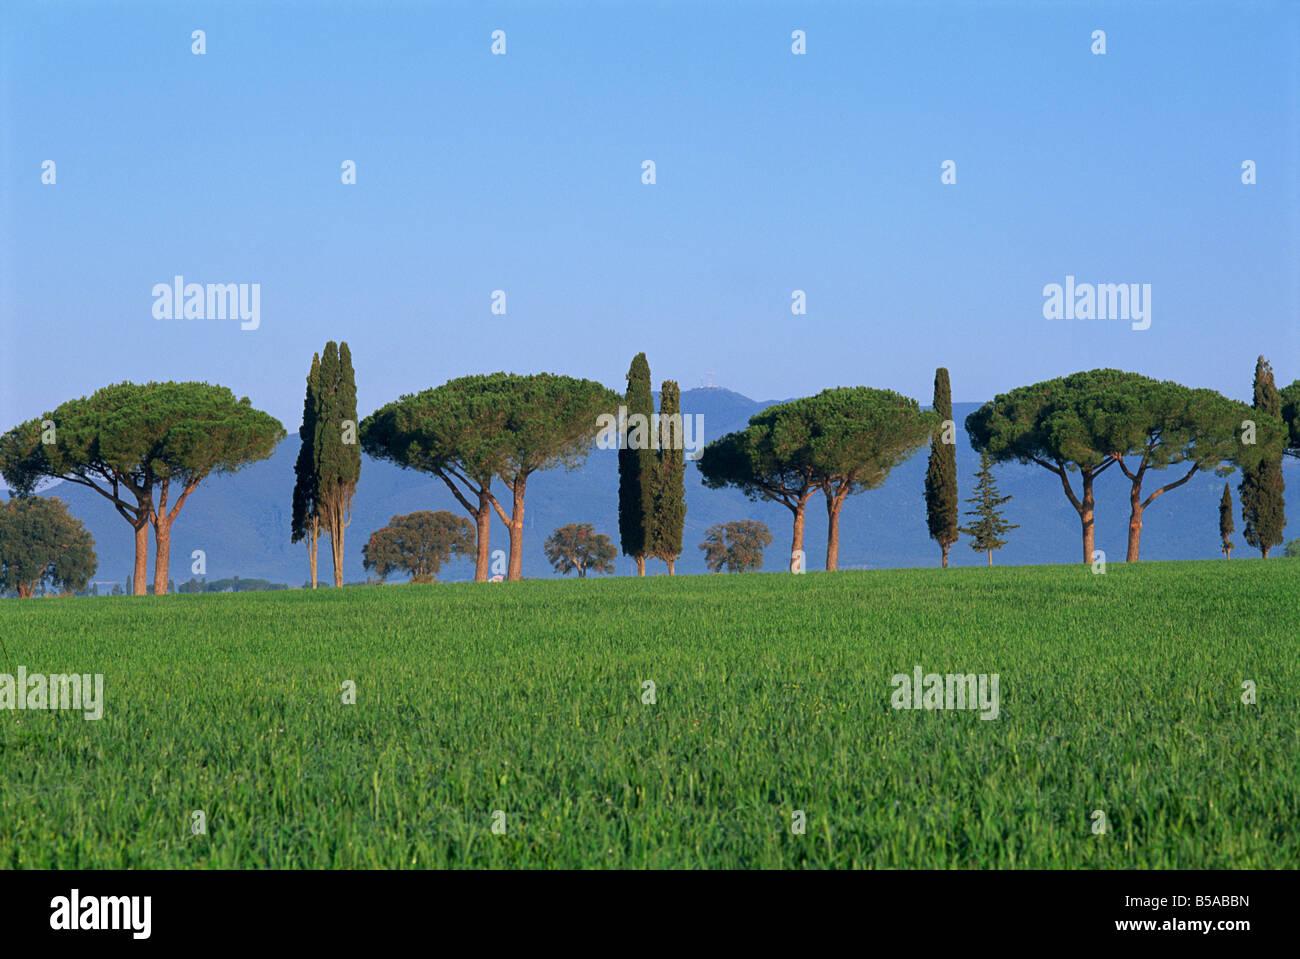 Pin parasol et cypres Paysage province de Grosseto Toscane Italy - Stock Image